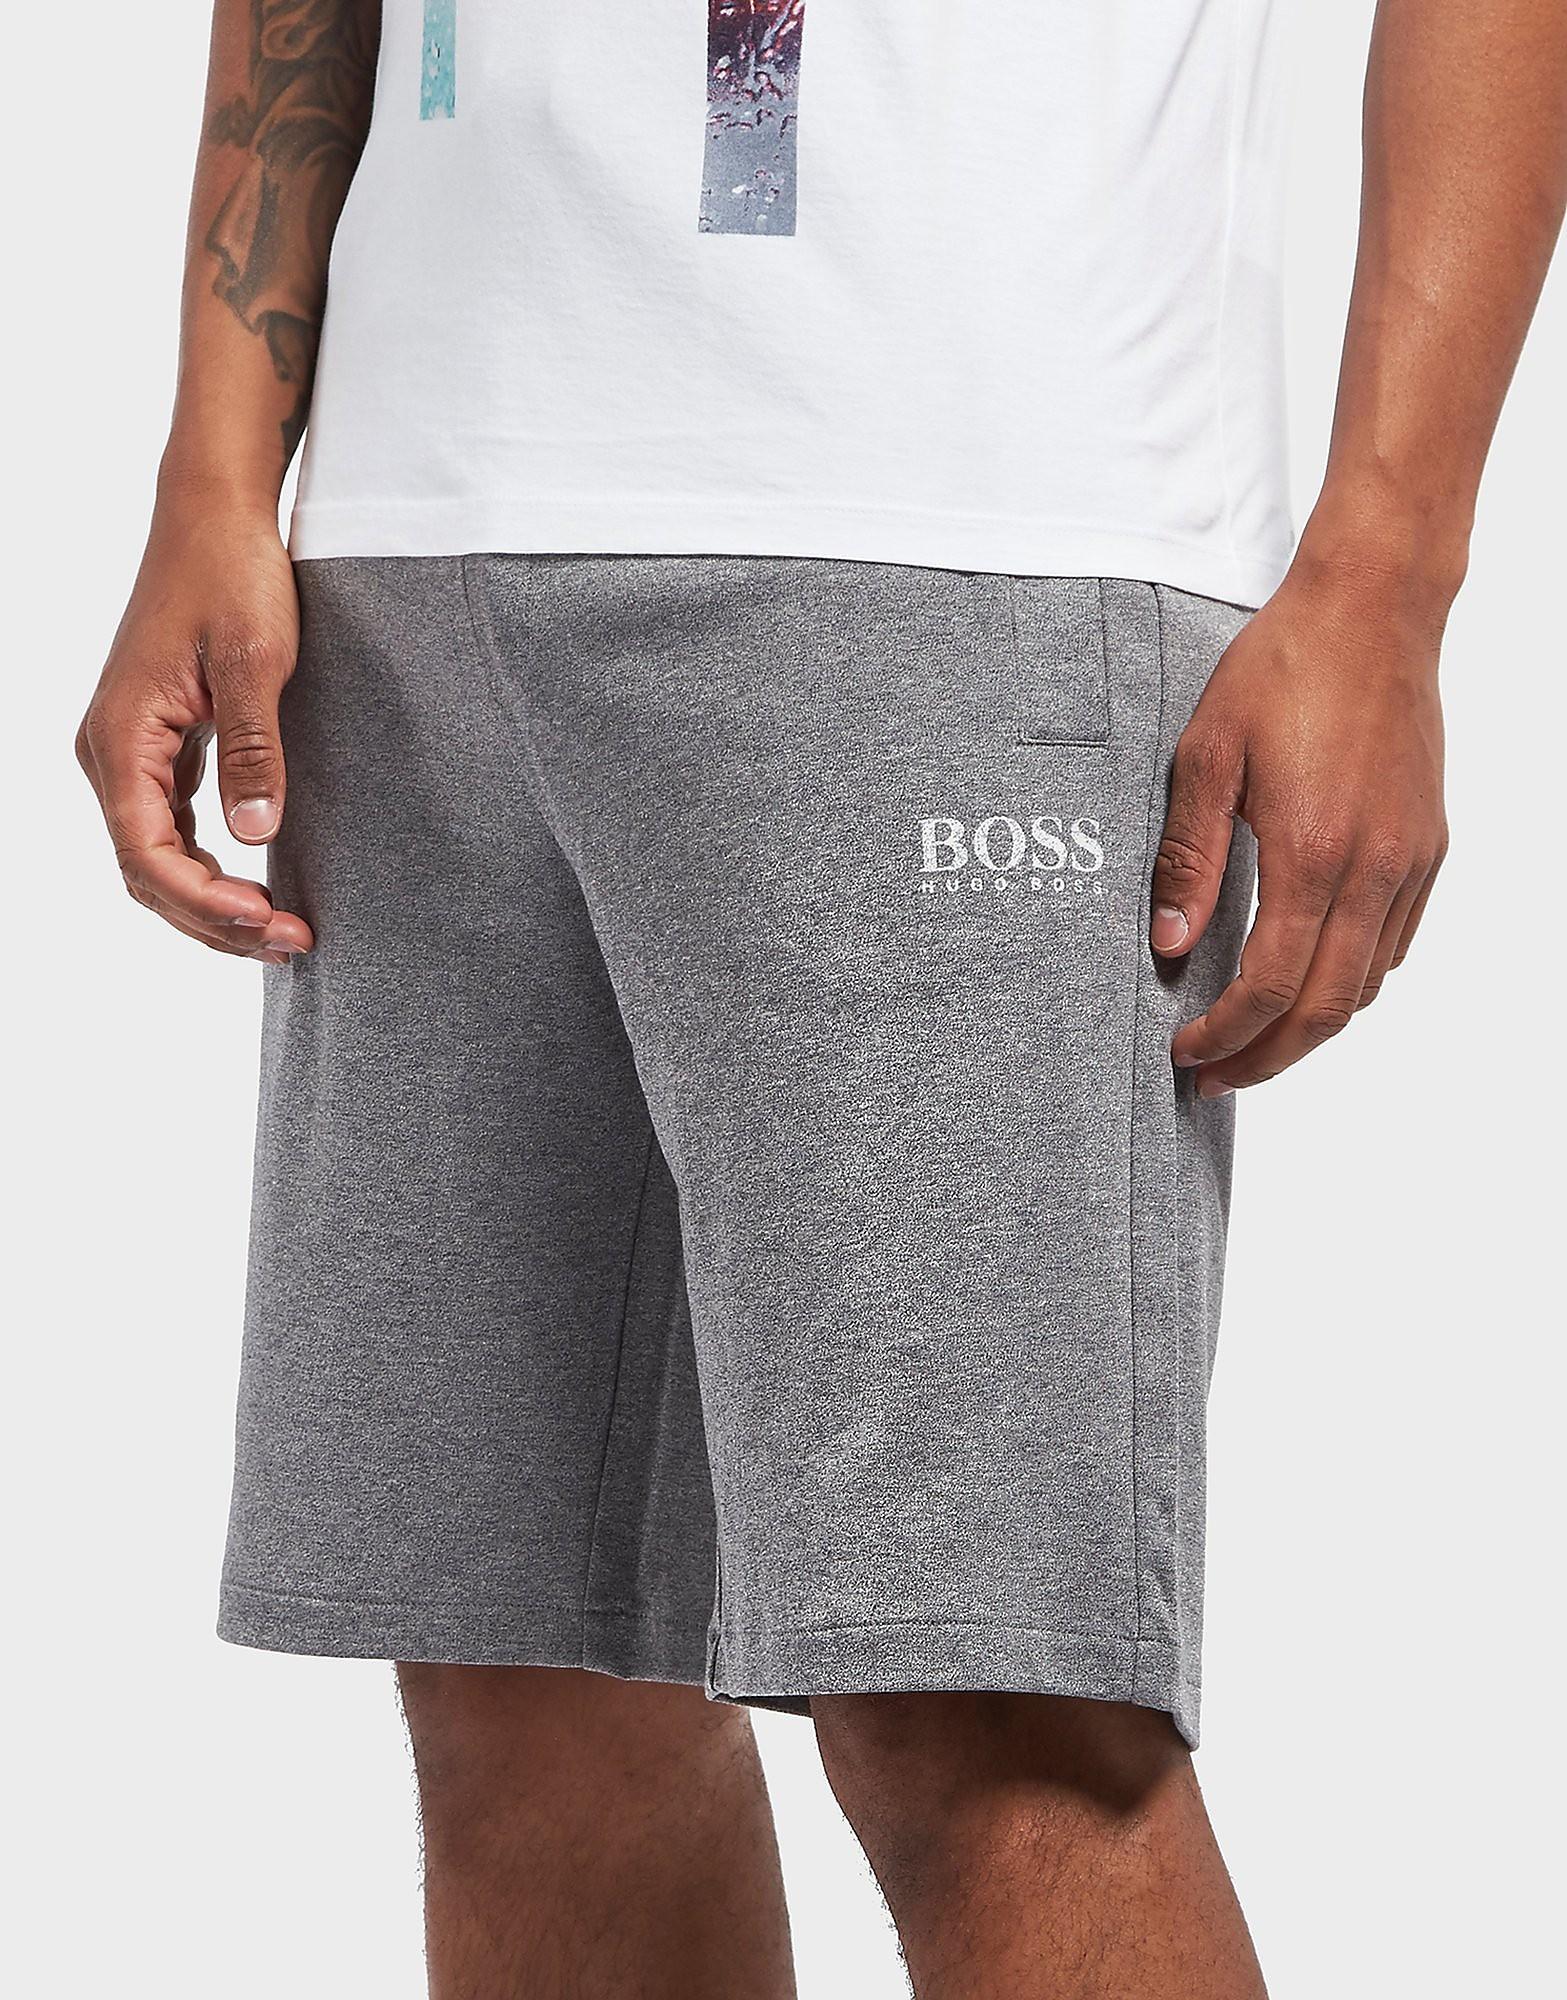 BOSS Marl Fleece Shorts